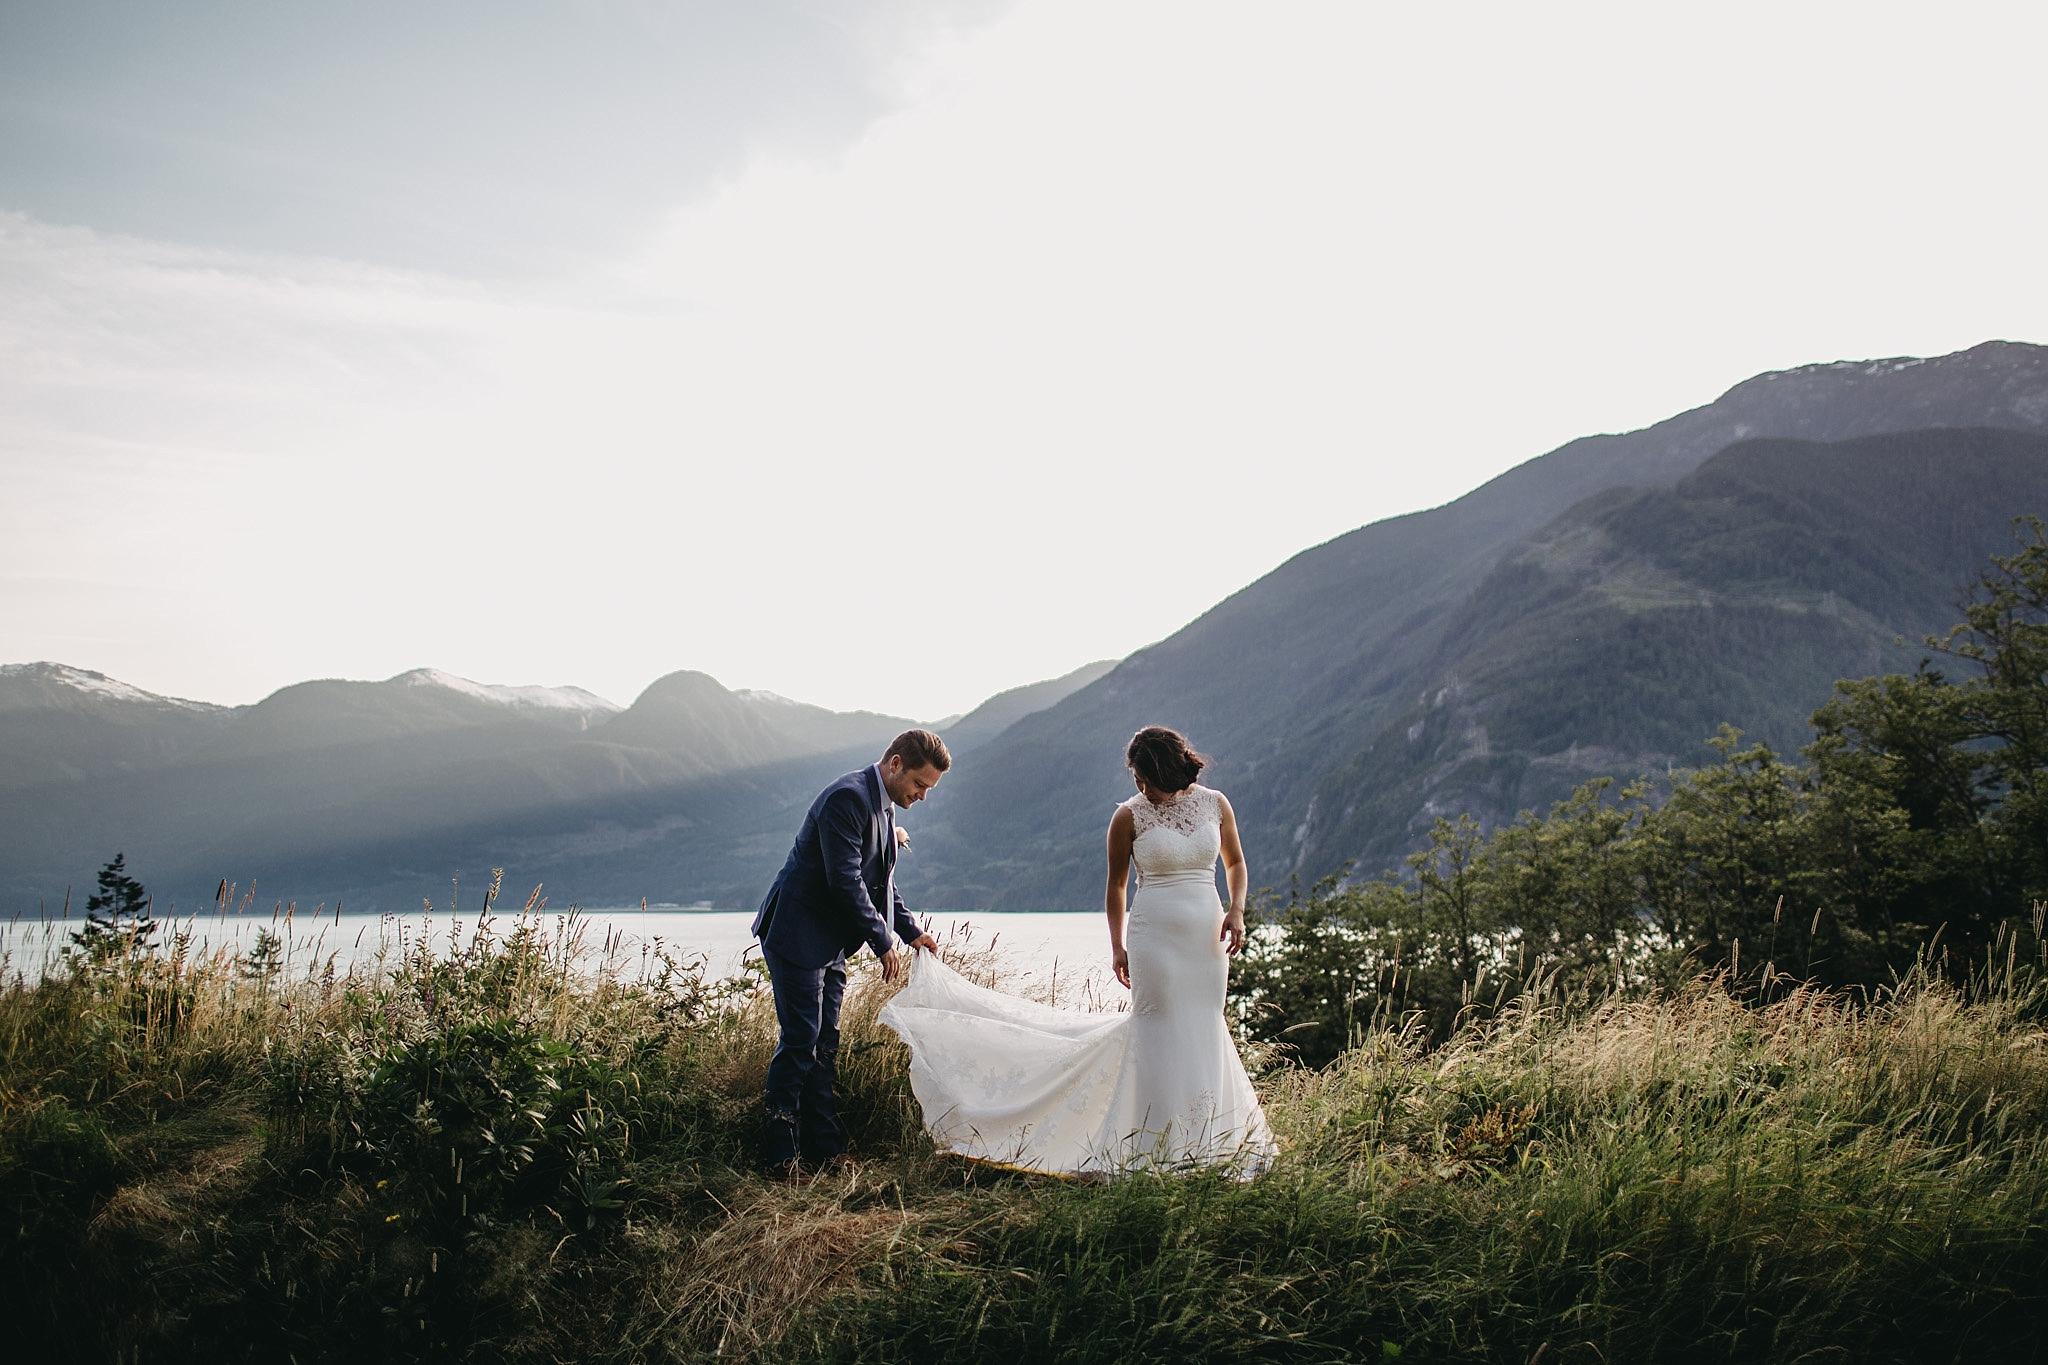 aileen-choi-photo-hart-house-wedding_0111.jpg